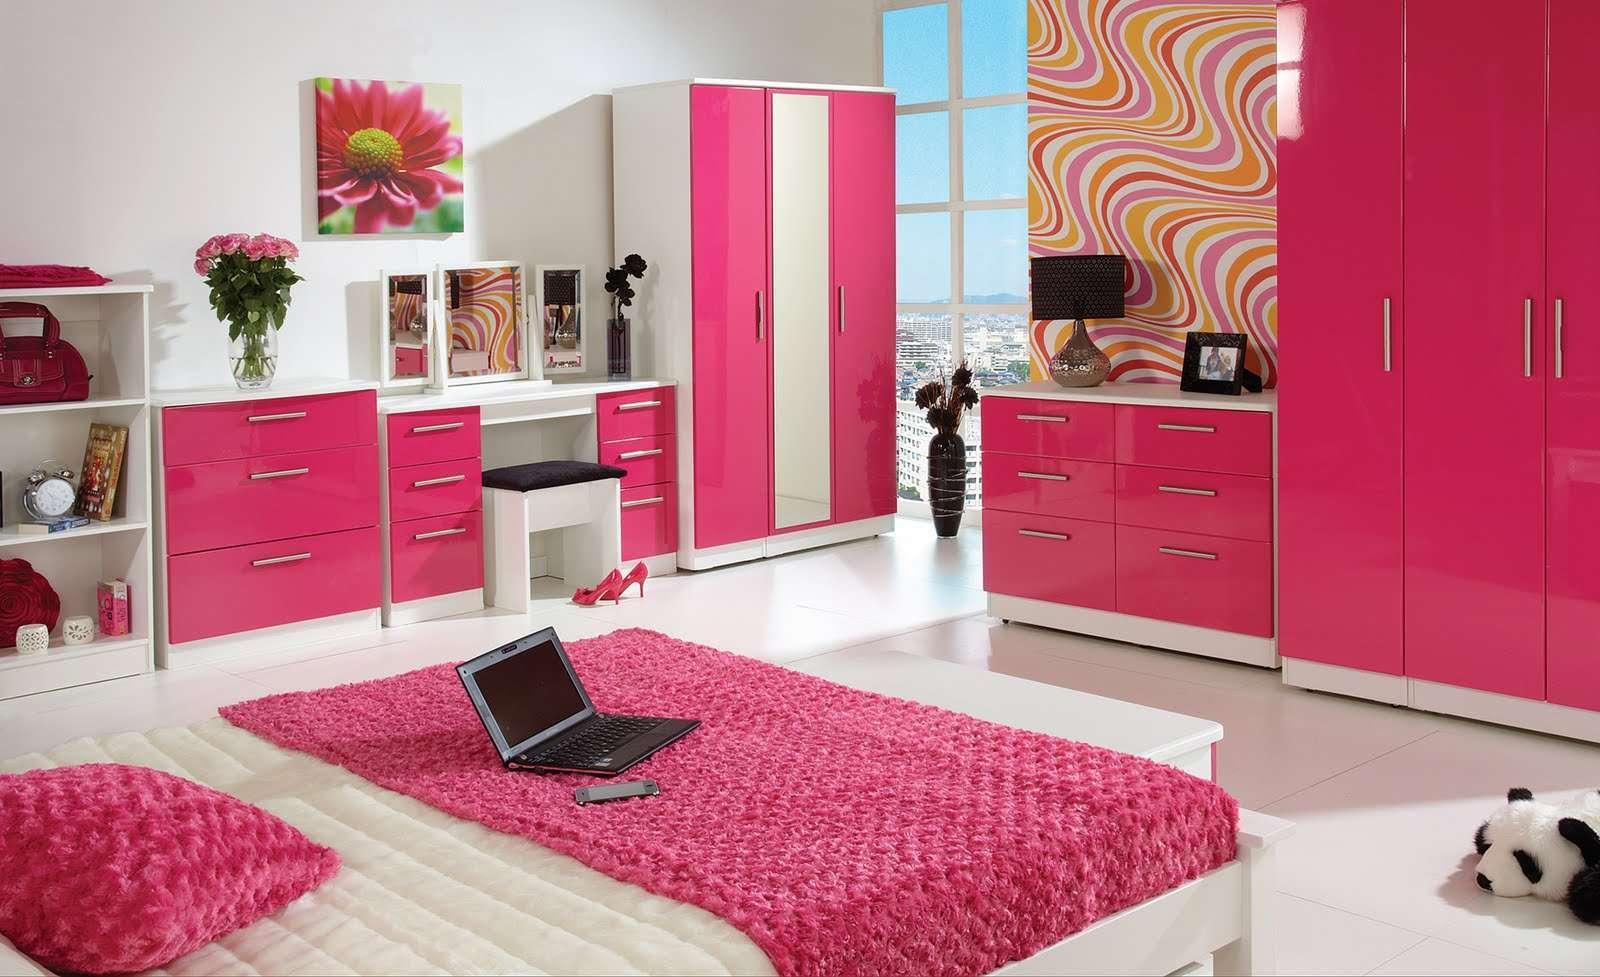 احدث ديكورات وتصاميم غرف نوم البنات | ديكور غرف